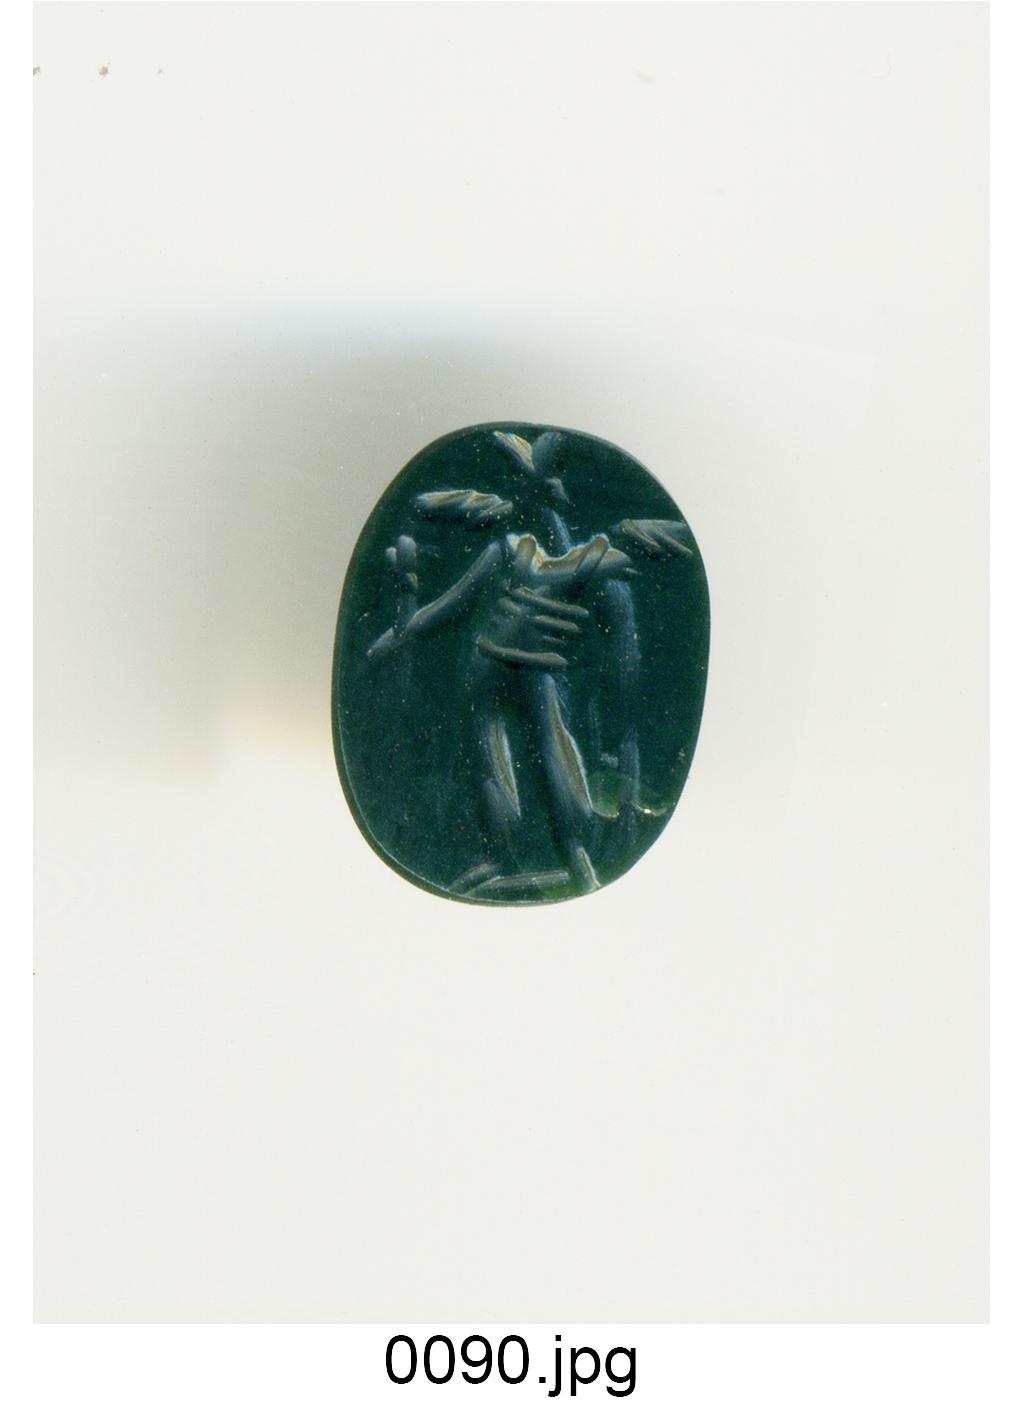 figura alata (gemma) - produzione italiana (sec. XVIII)